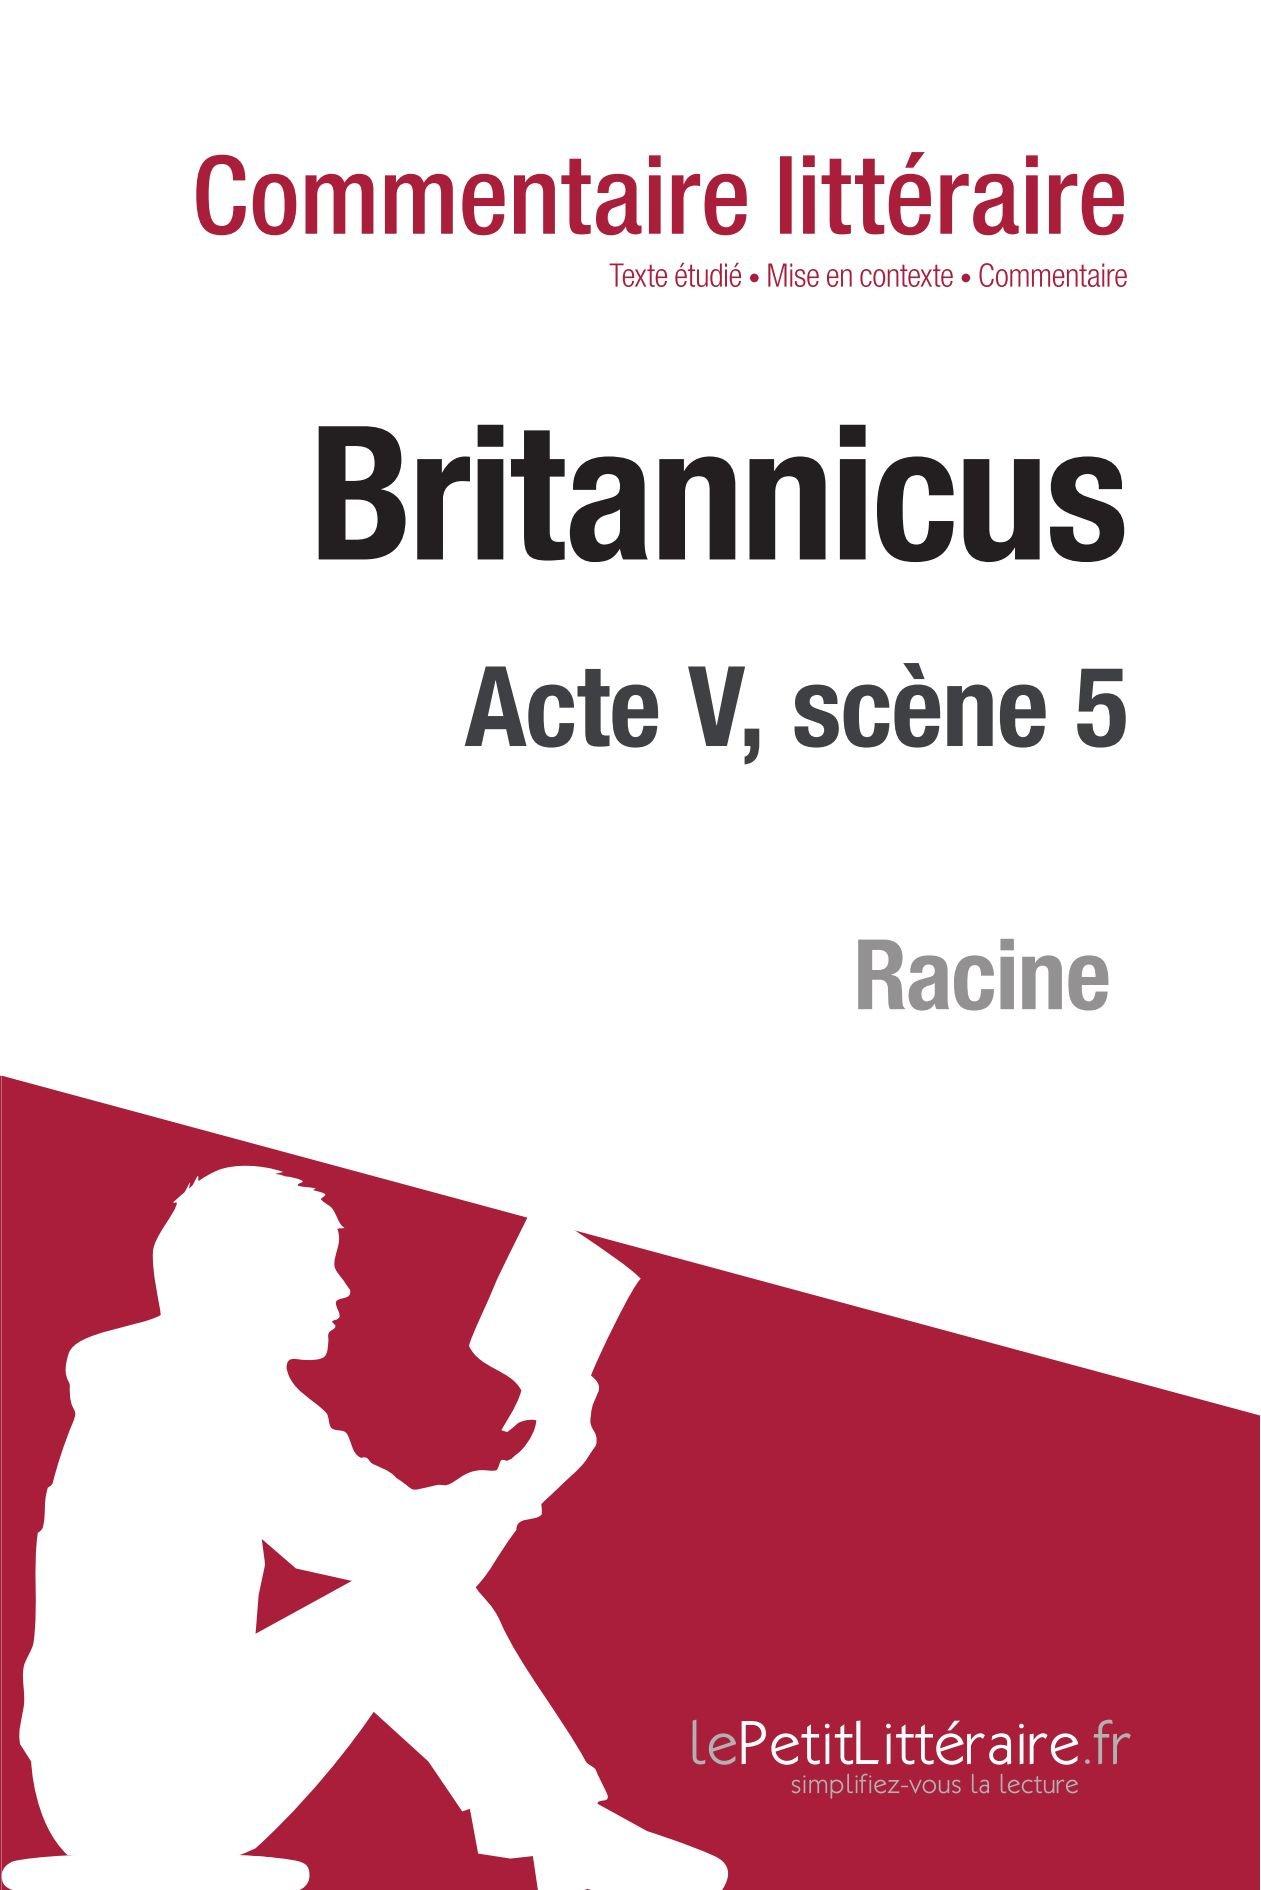 Essay proofreading service - COTRUGLI Business School britannicus ...